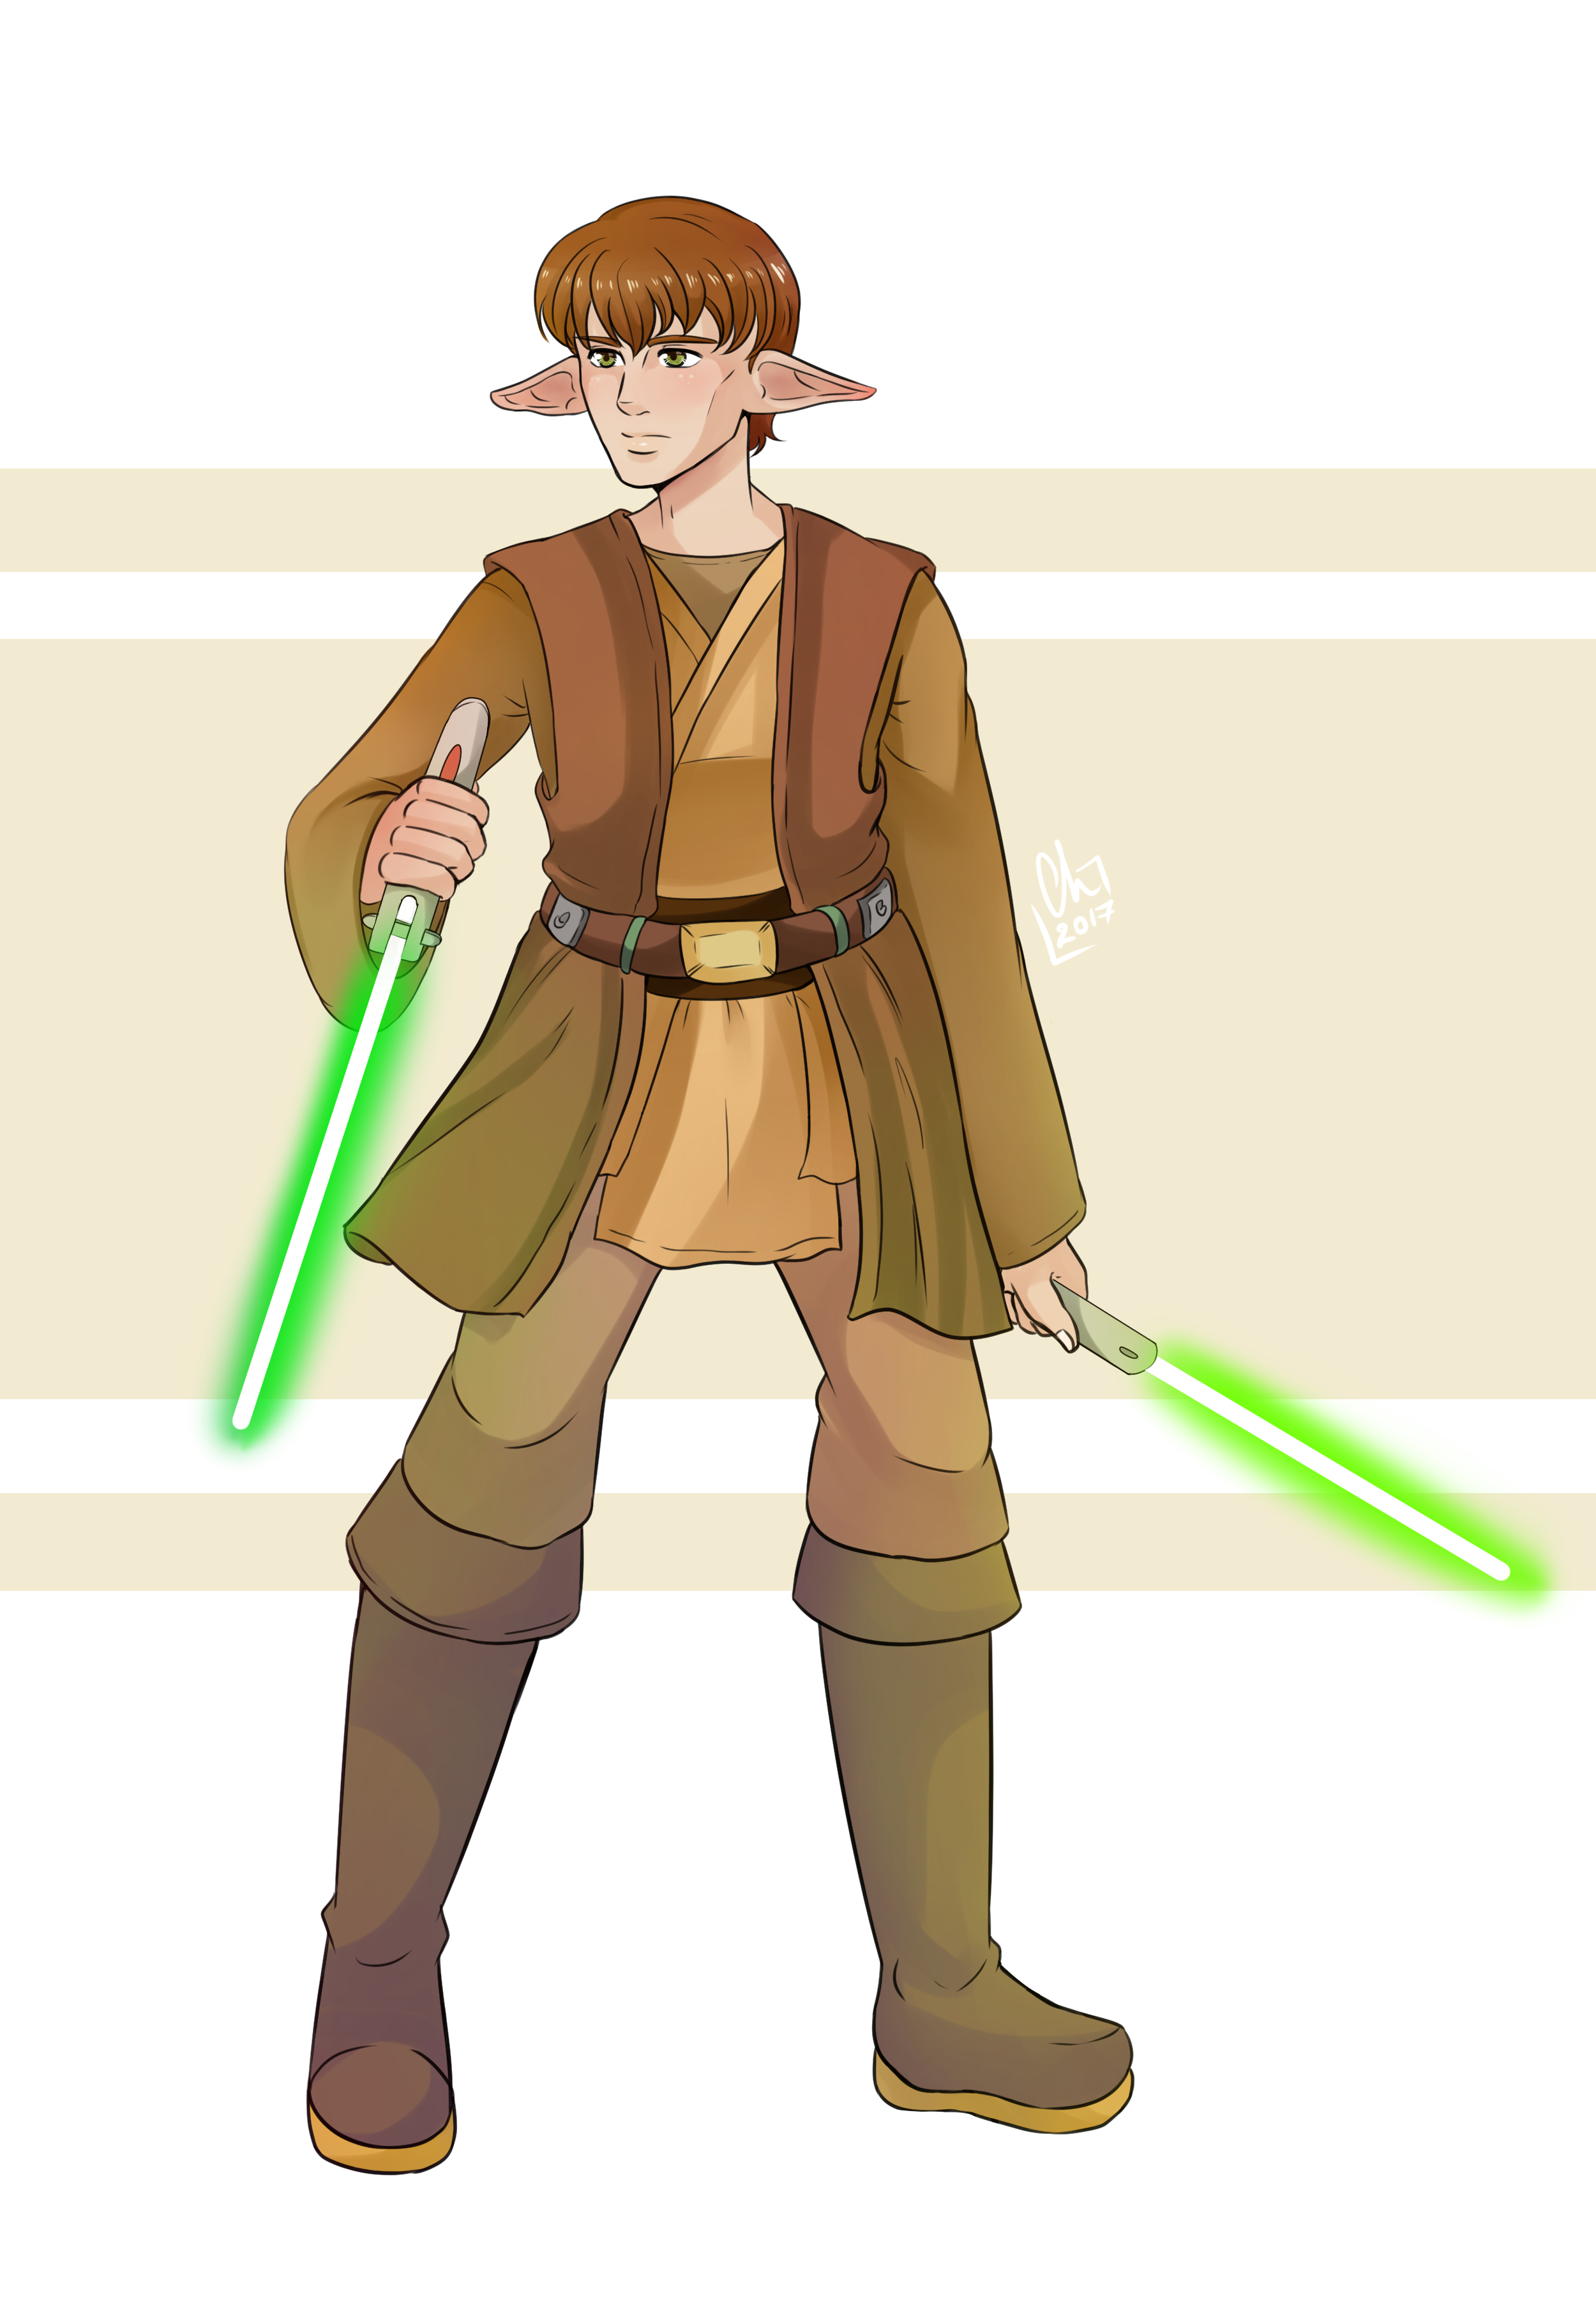 [Crossover] - Jedi Akayo by Chyche